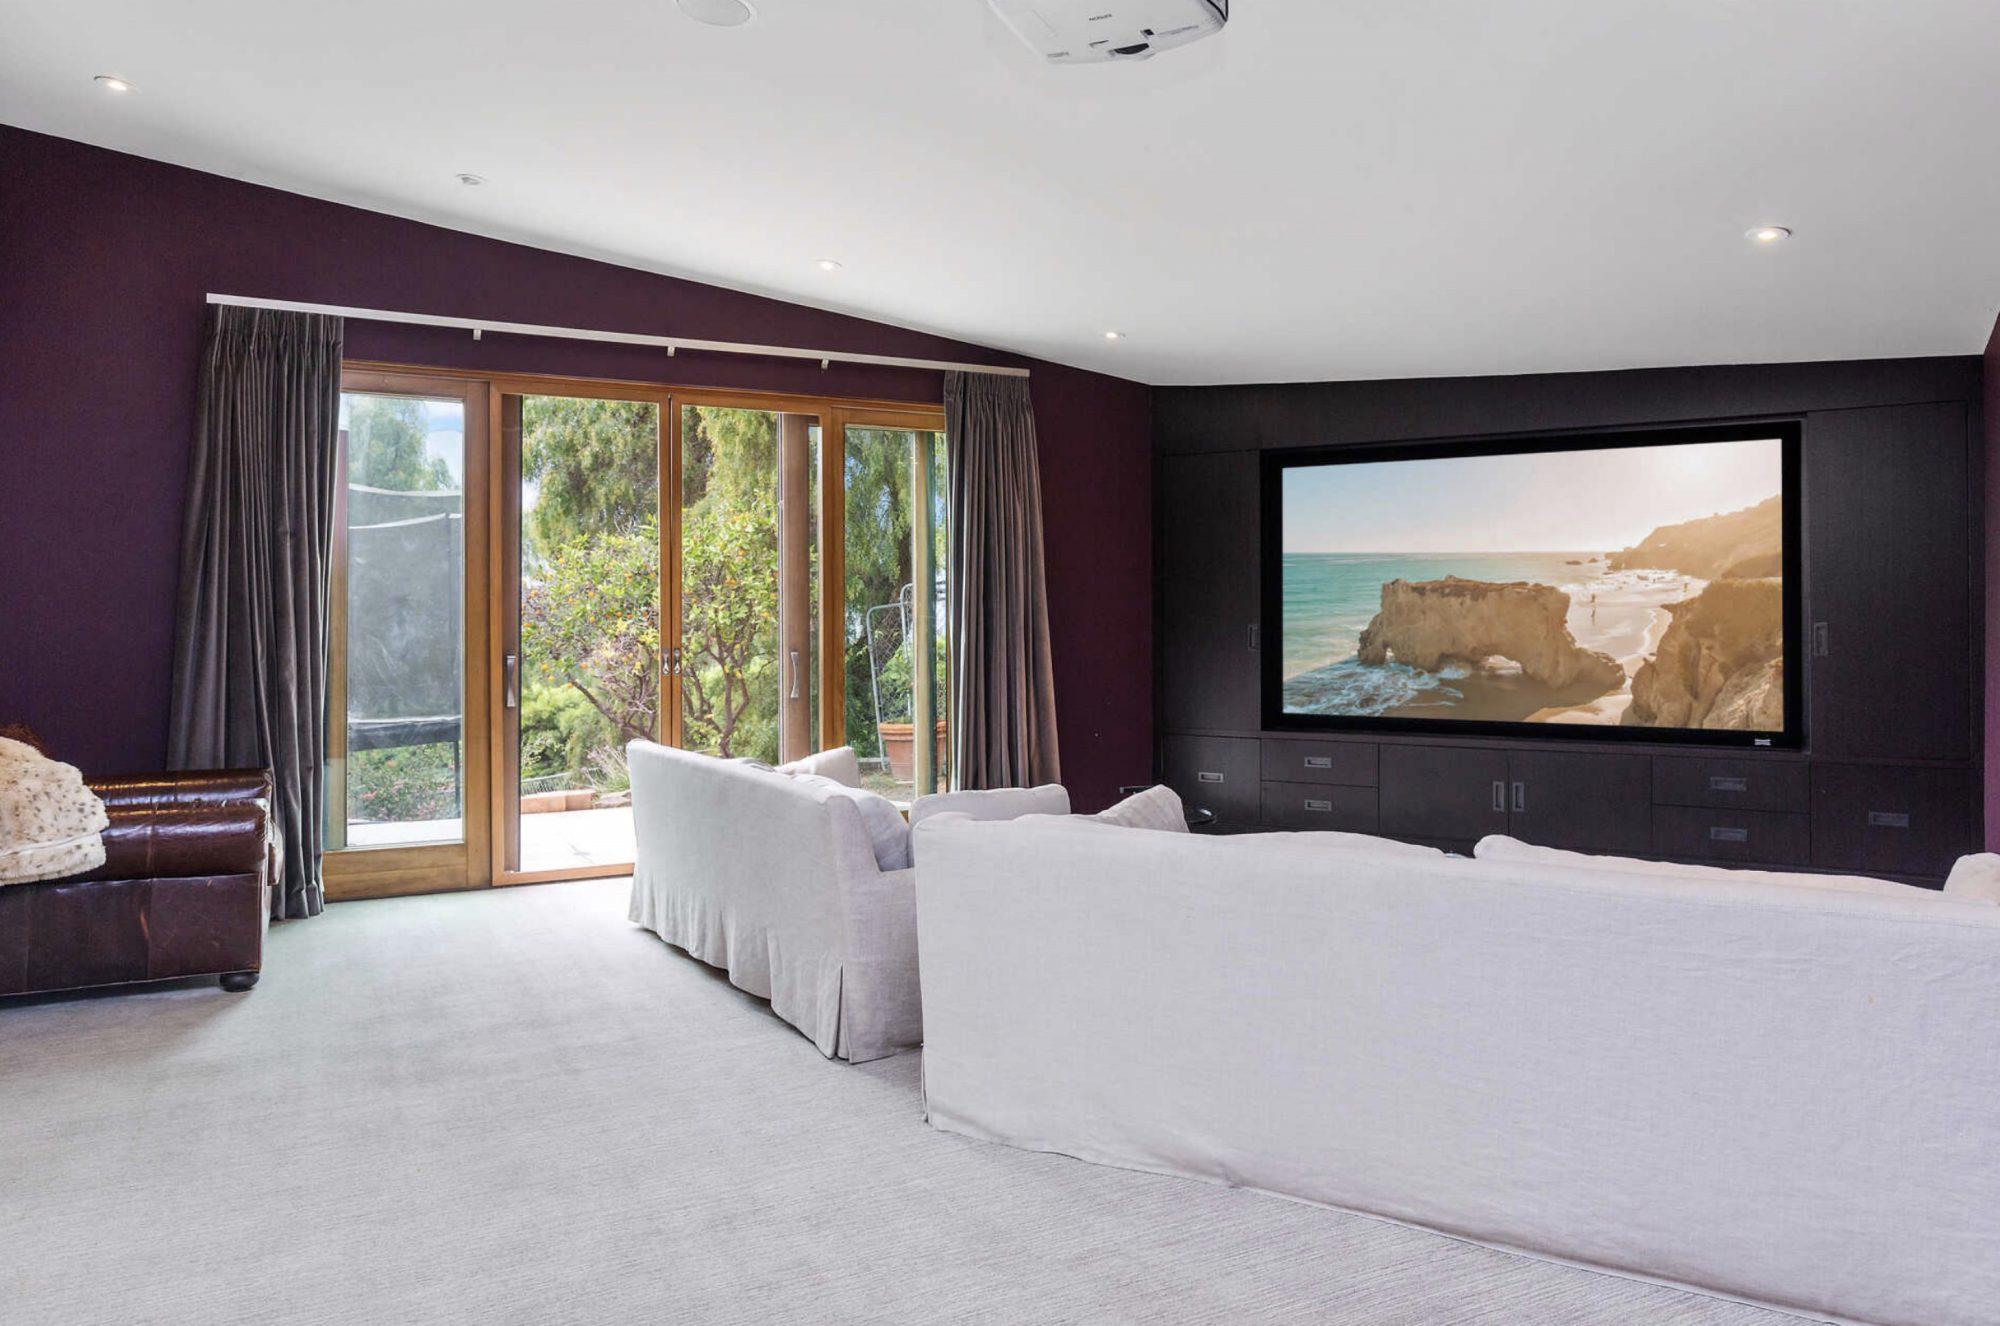 Chris Hemsworth and Elsa Pataky's Malibu house